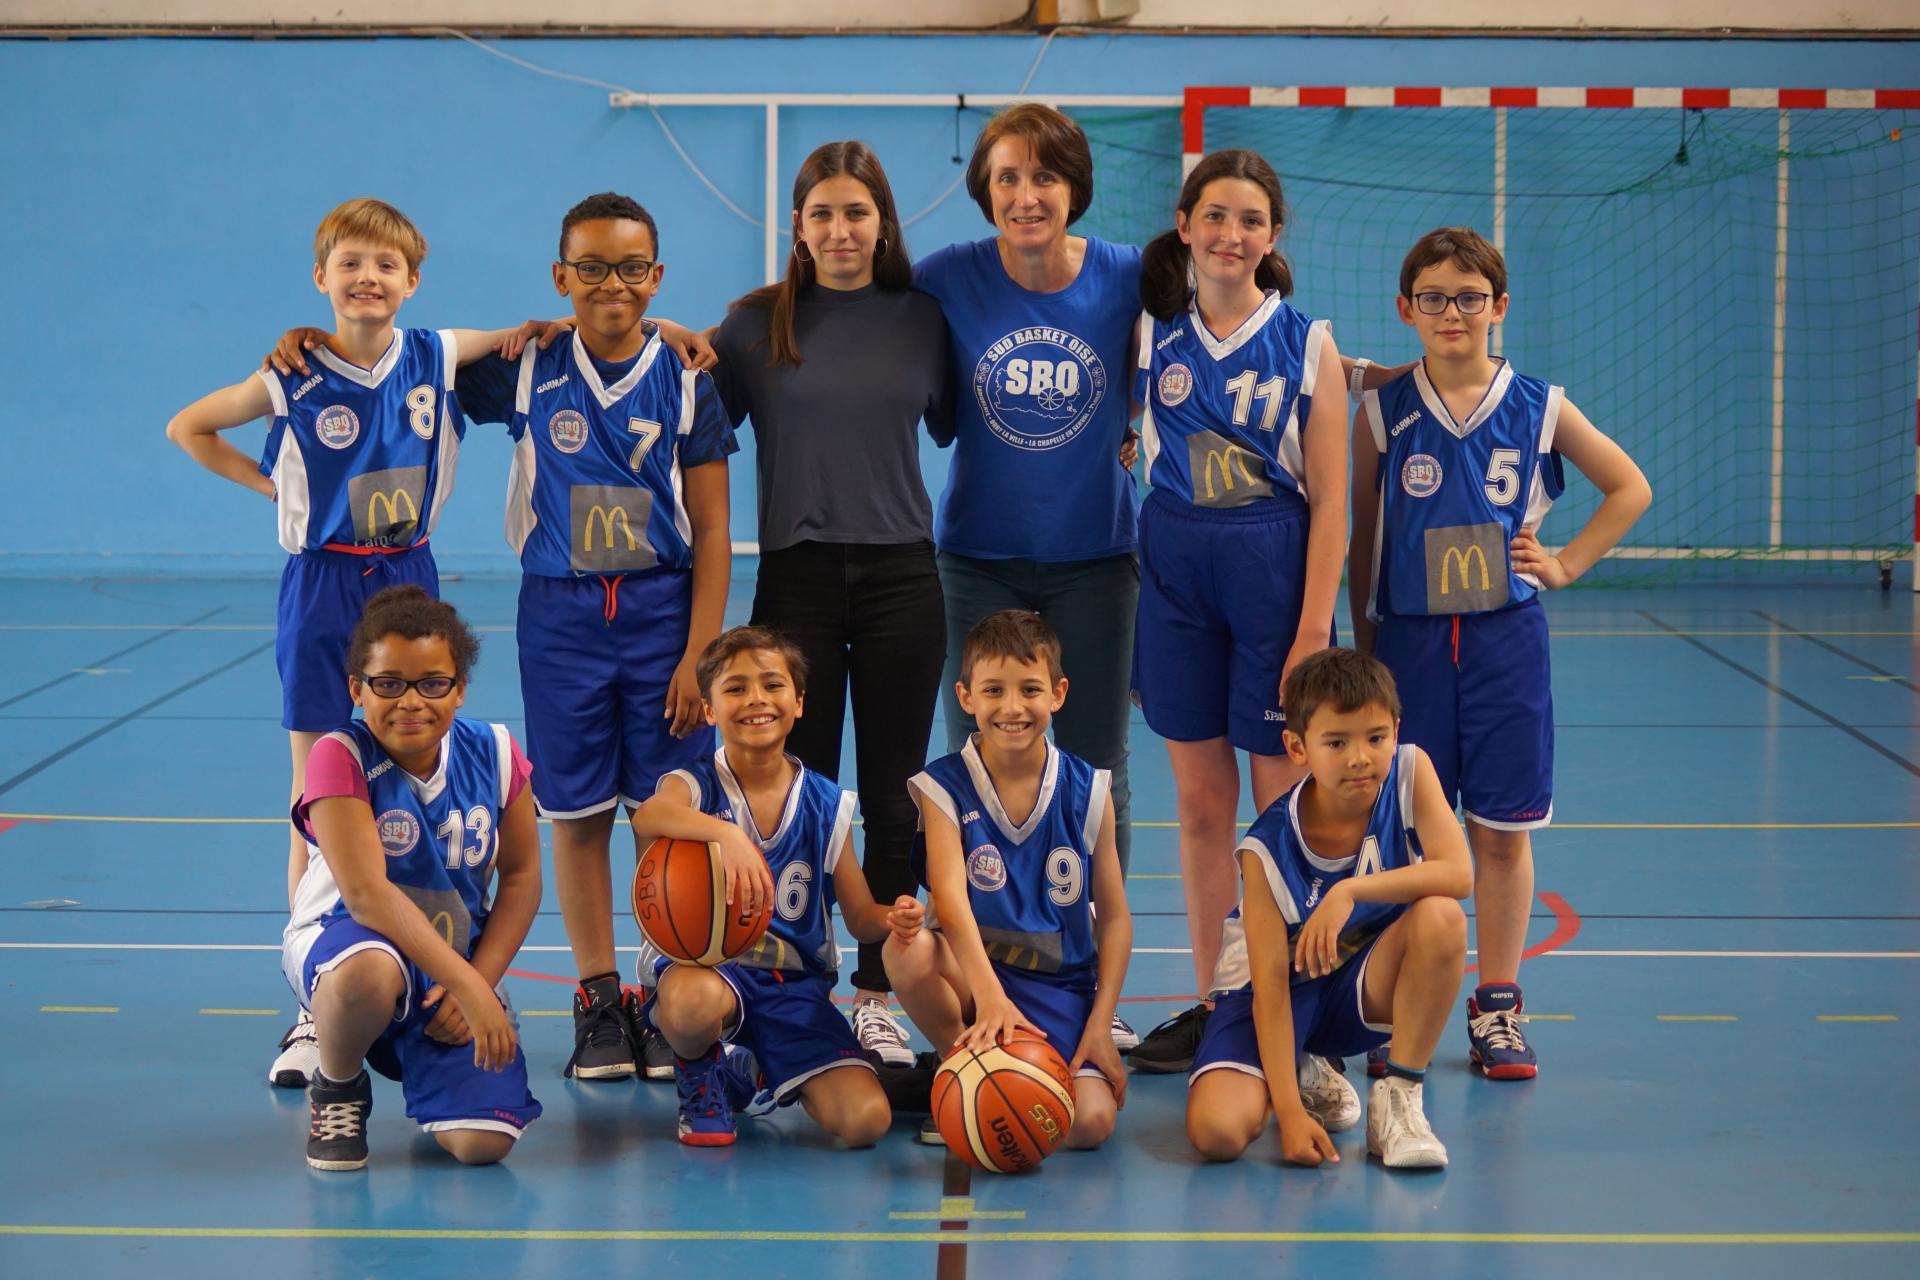 U11 Sud Basket Oise Saison 2018-2019